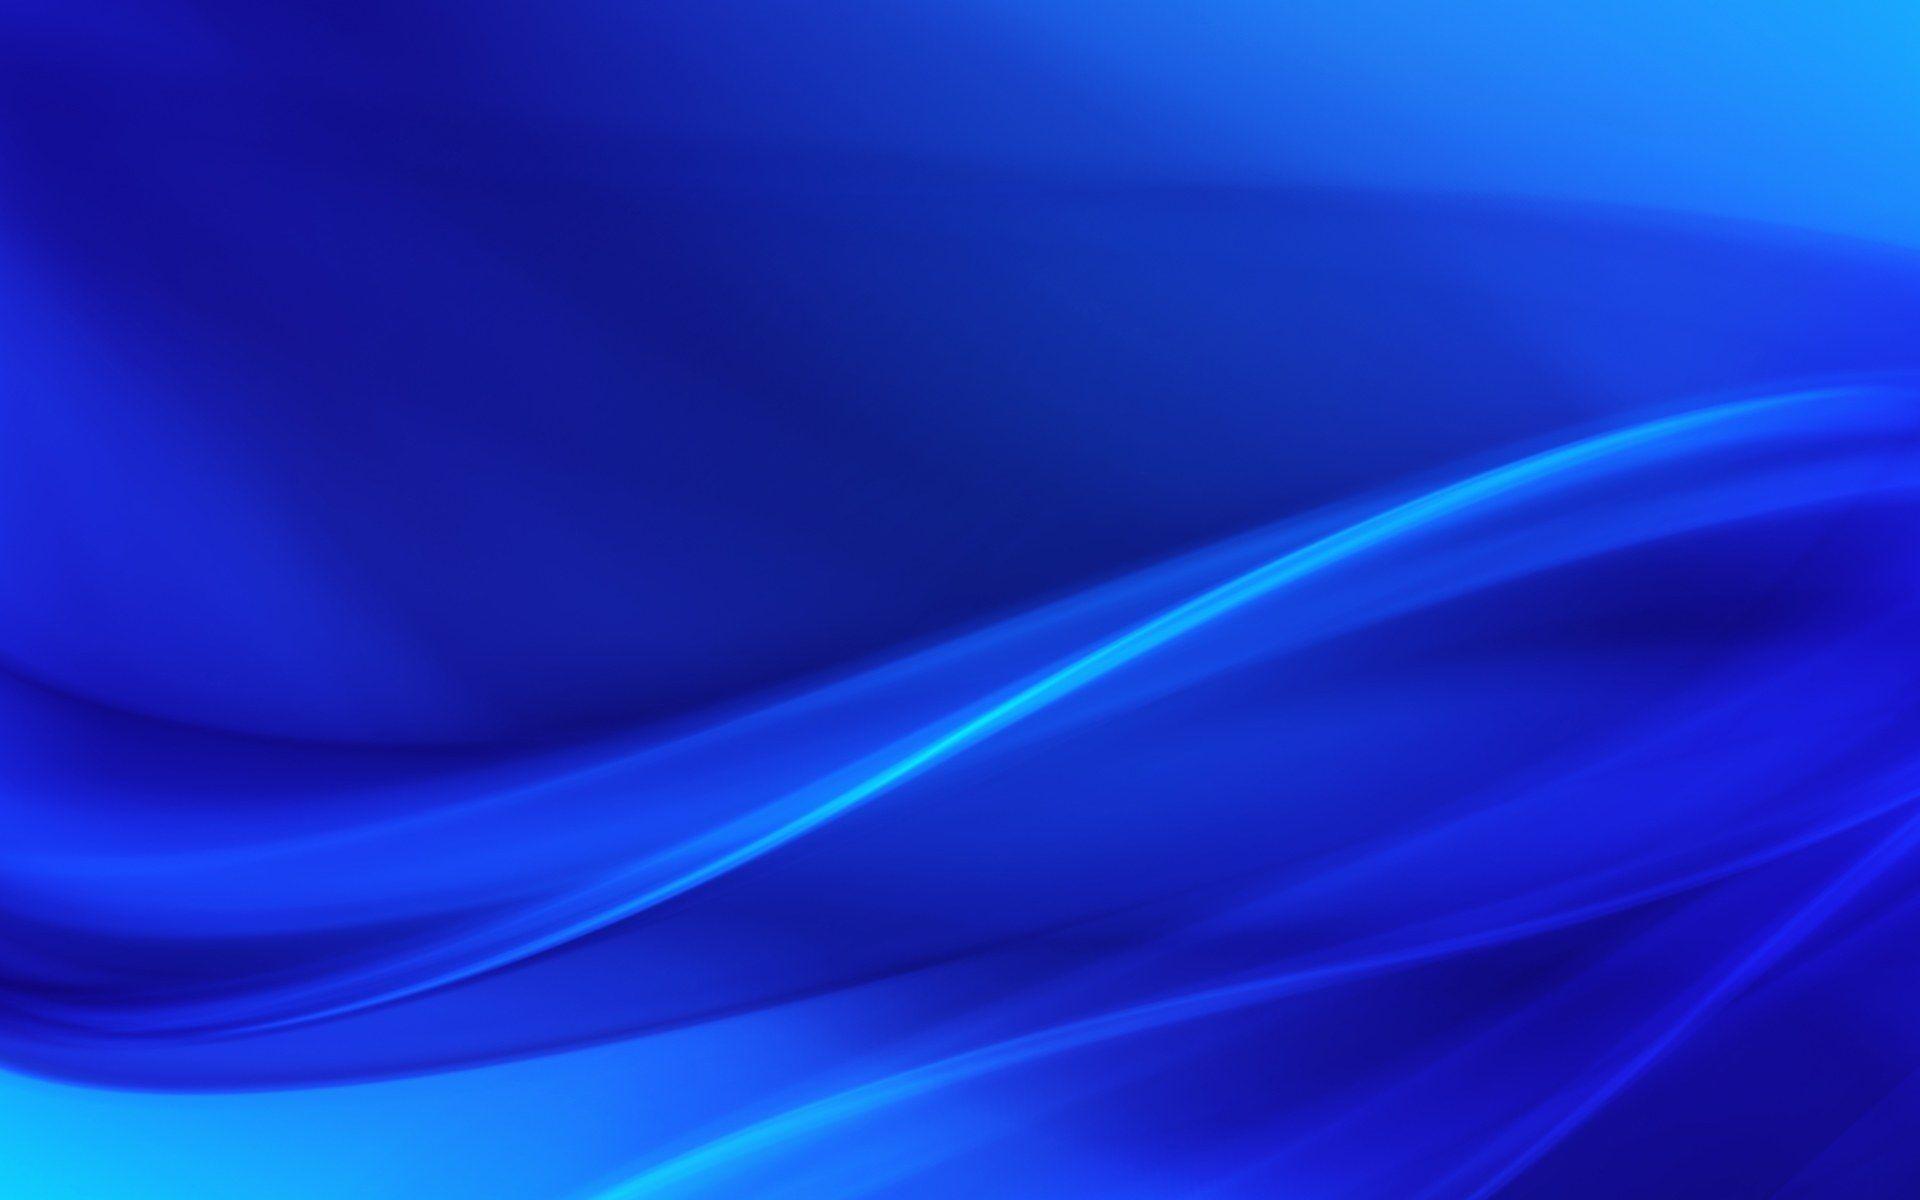 blue12.jpg